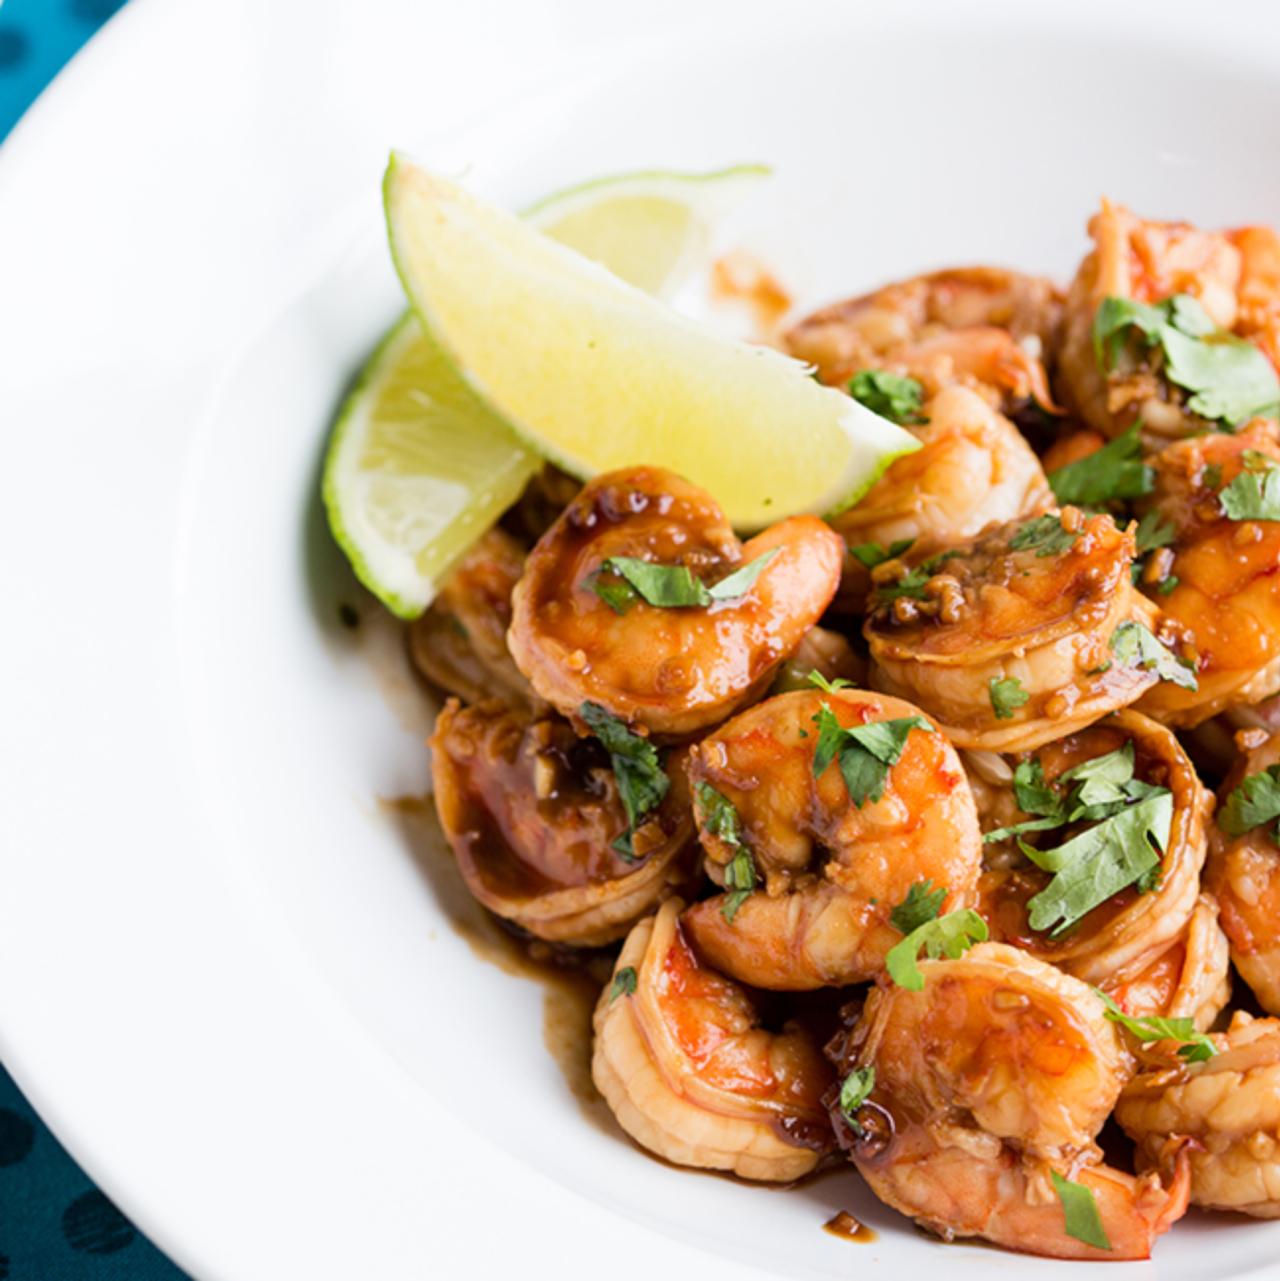 honey-garlic-shrimp-feature-8-52833-1280x0